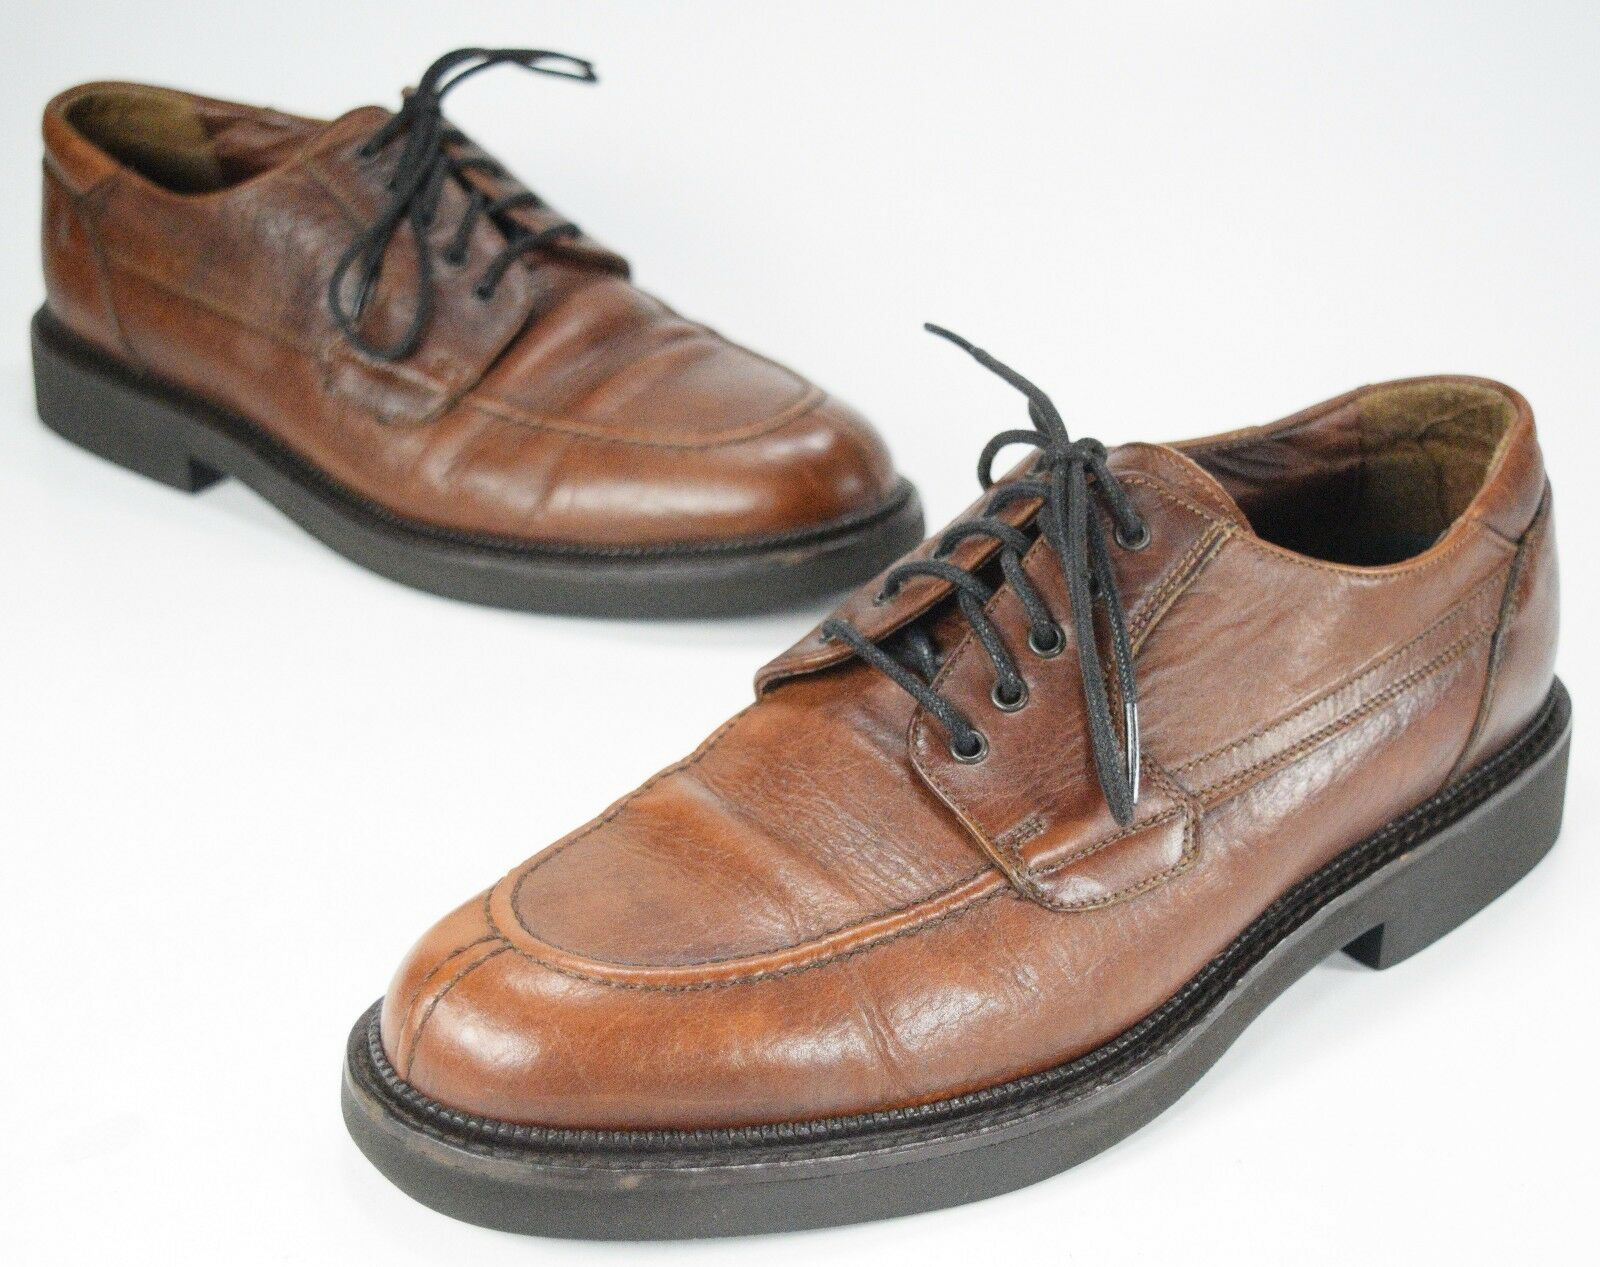 H.S. Trask Brown Full Grain Leather Oxfords Men's Size 11 (M) Split Toe Shoes